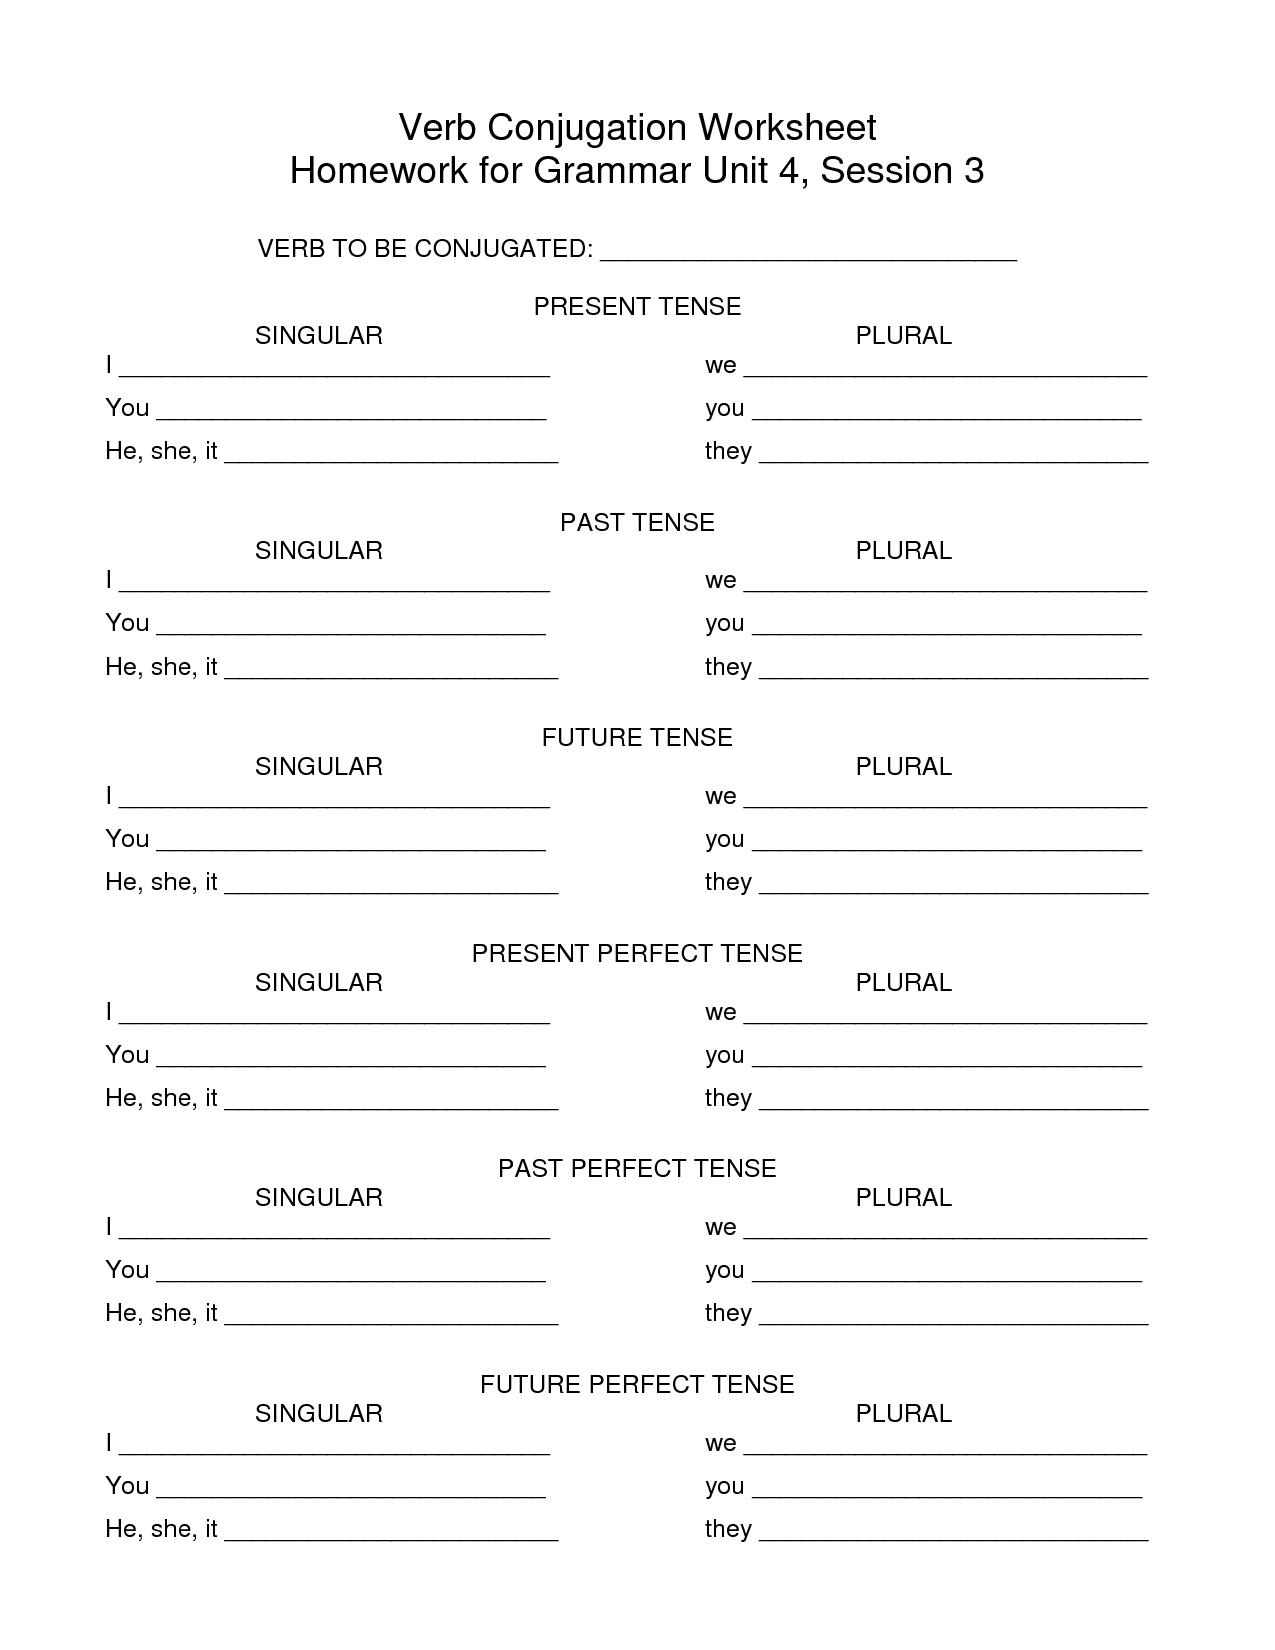 Spanish verb conjugation worksheets blank also para la clase rh pinterest